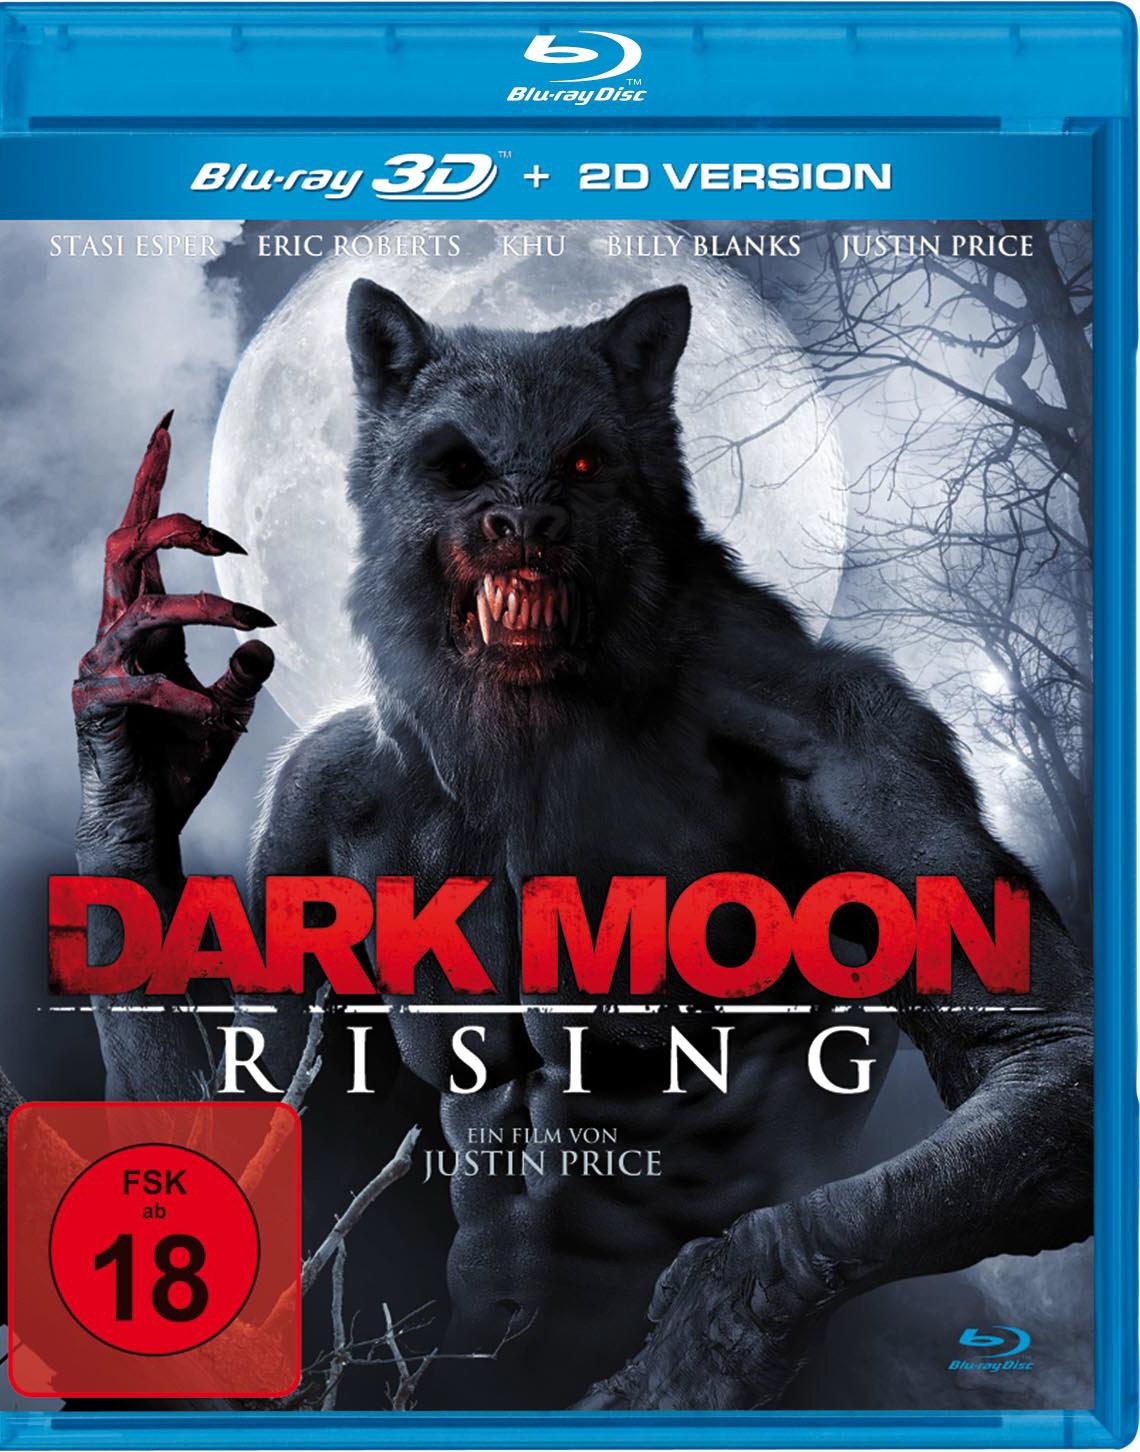 Dark Moon Rising 3D (2015) - (Blu-ray 3D (+2D))